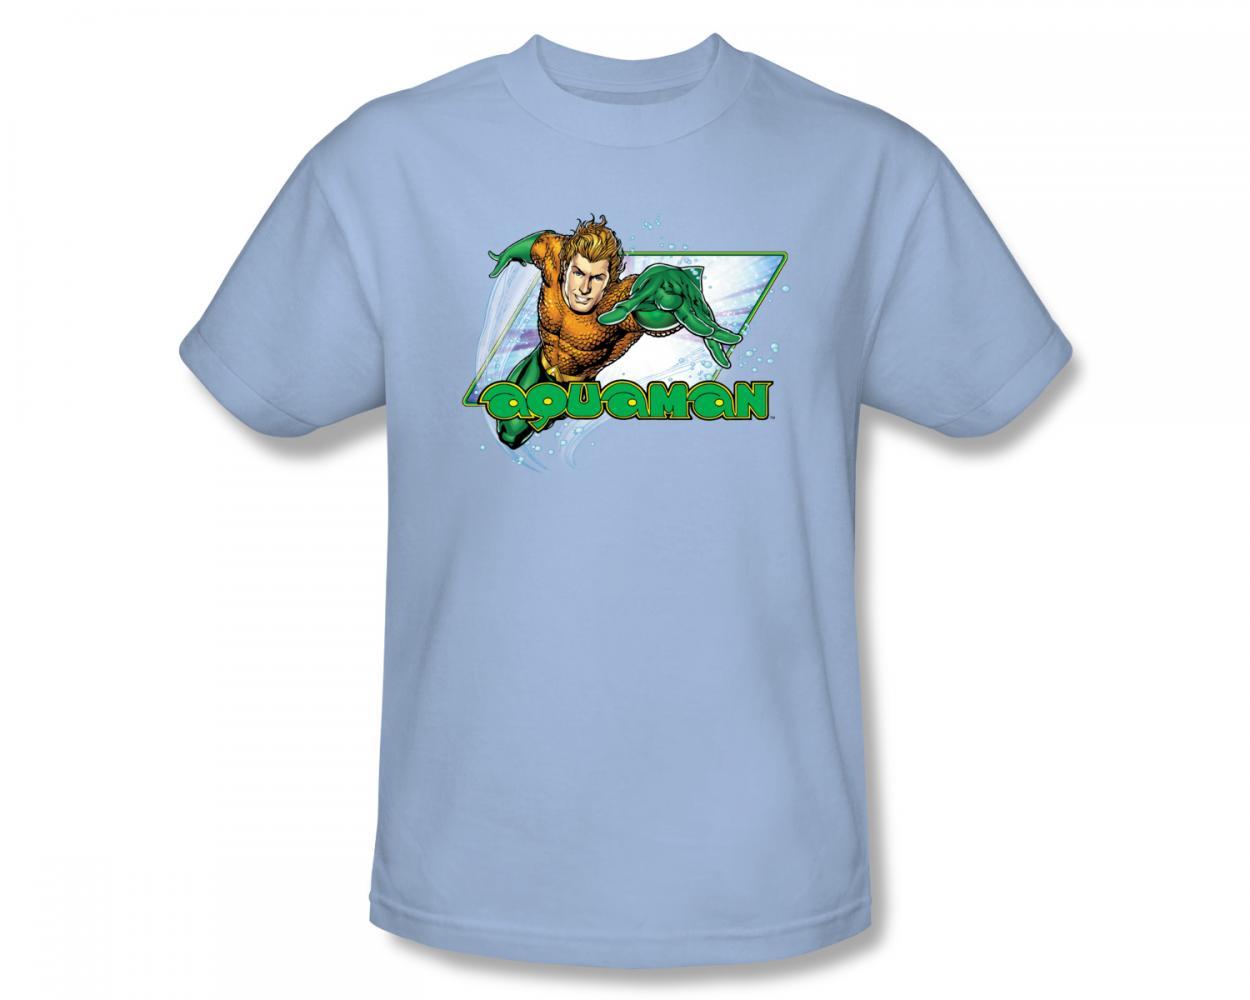 Image of Aquaman - Aquaman Slim Fit Adult T-Shirt In Light Blue